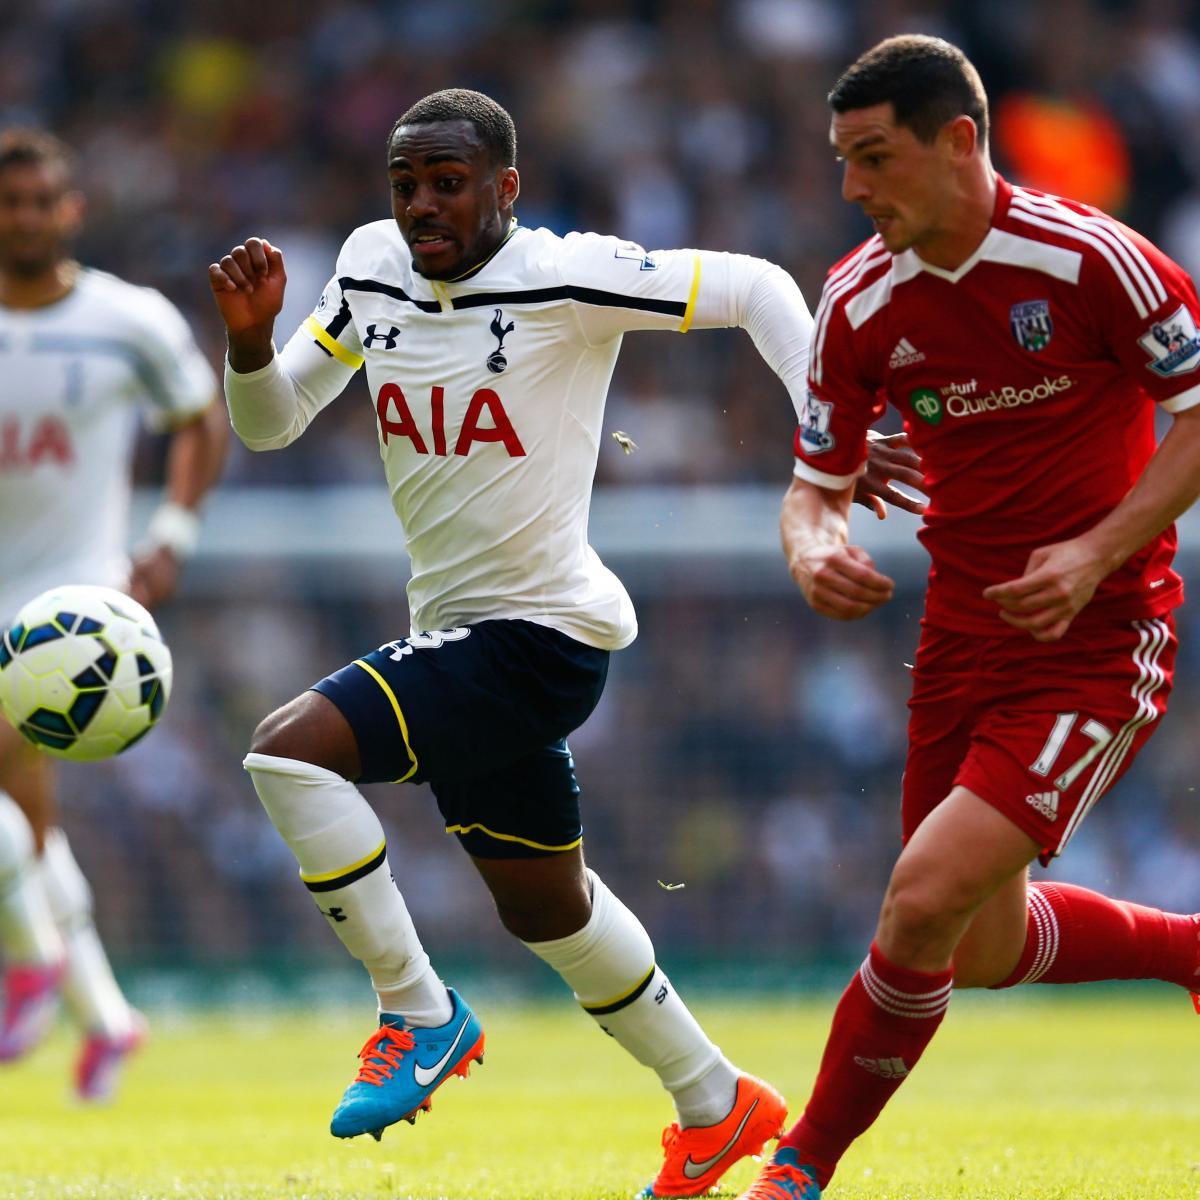 Tottenham Vs Ajax Home Or Away: Tottenham Hotspur Vs. West Brom: Winners And Losers From